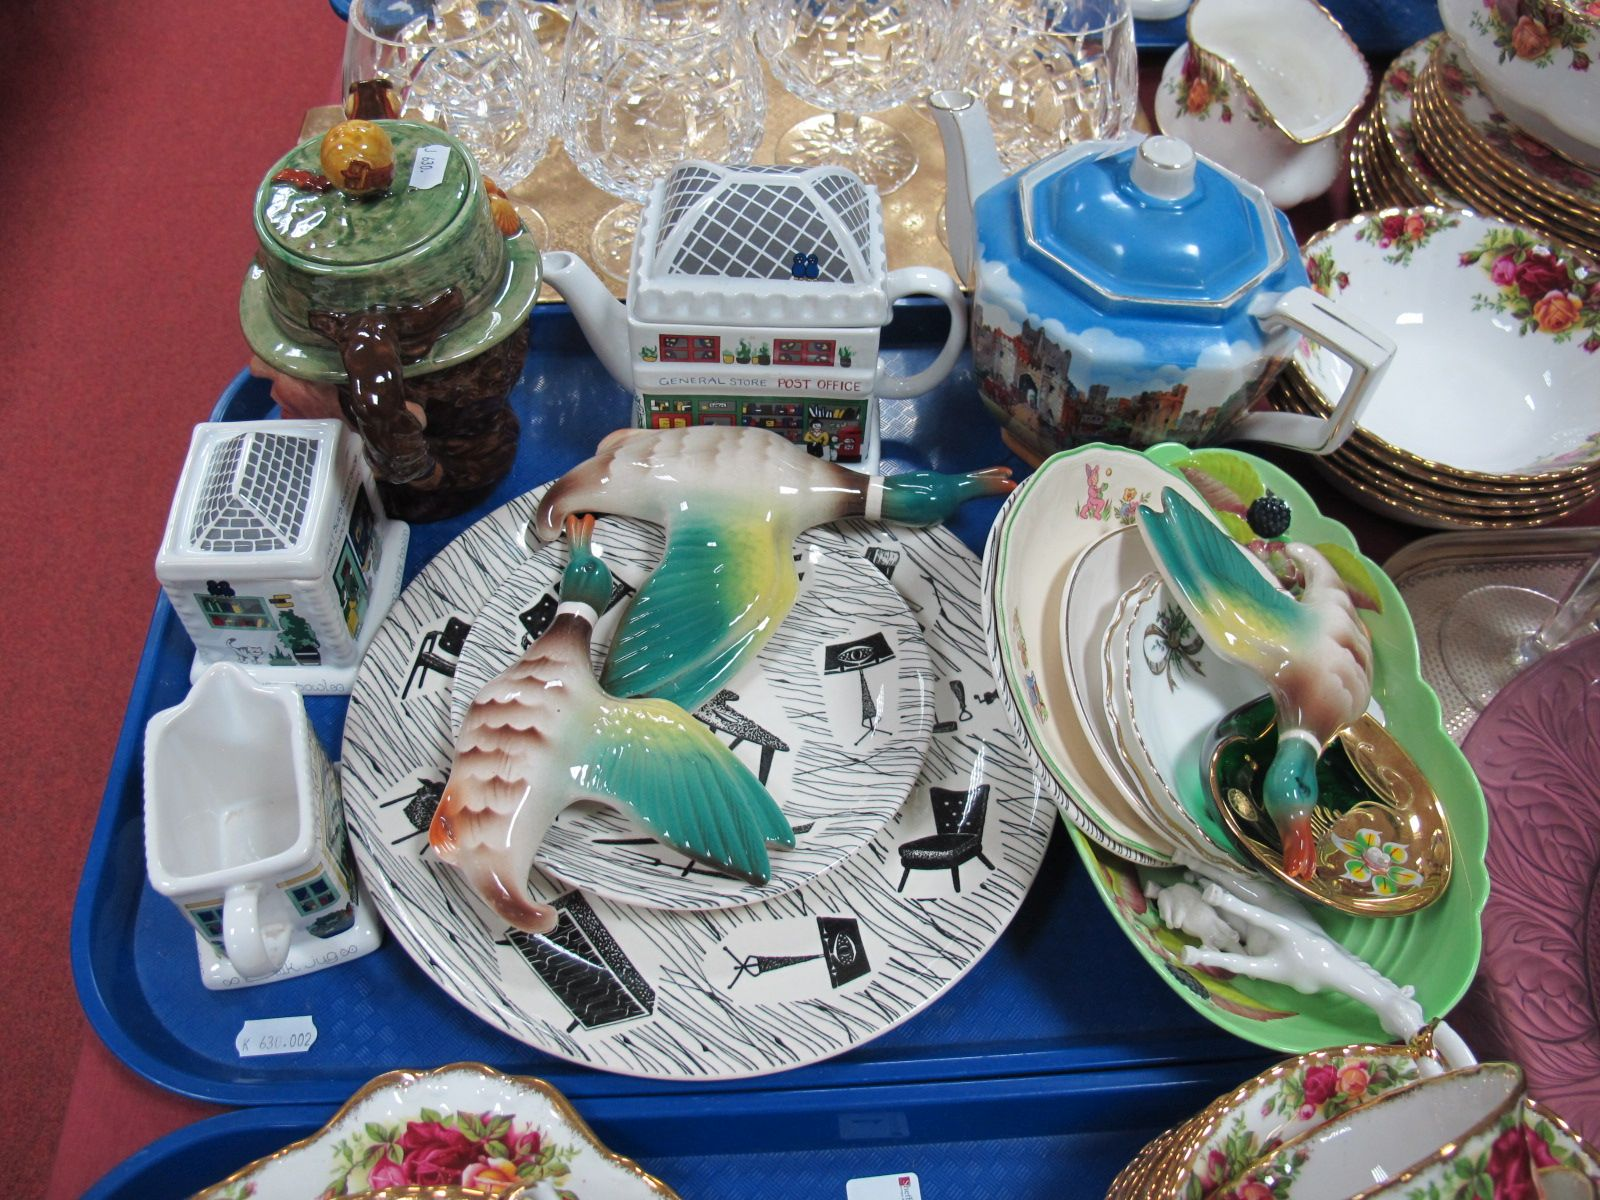 Lot 3 - Three Pottery Flying Ducks, Wade tea set, Beswick & Newhall teapots, homemaker plates, etc:- One